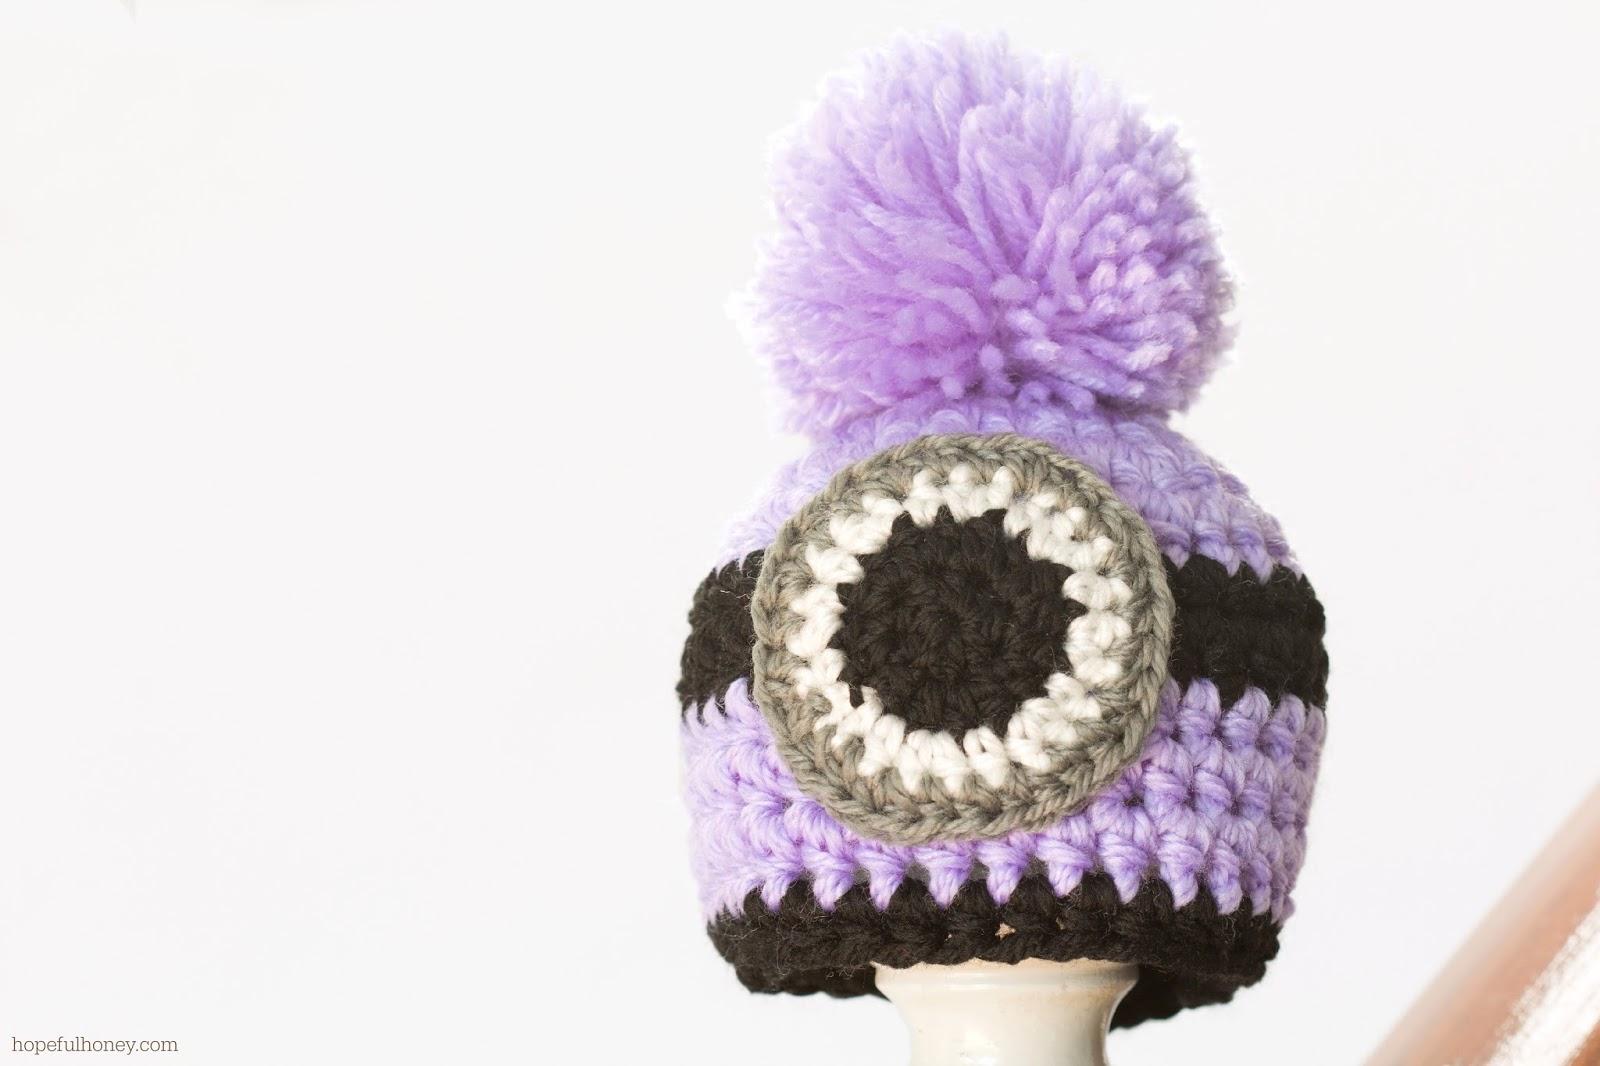 Free crochet pattern for newborn minion hat manet for newborn evil minion inspired hat interweave free crochet pattern bankloansurffo Image collections